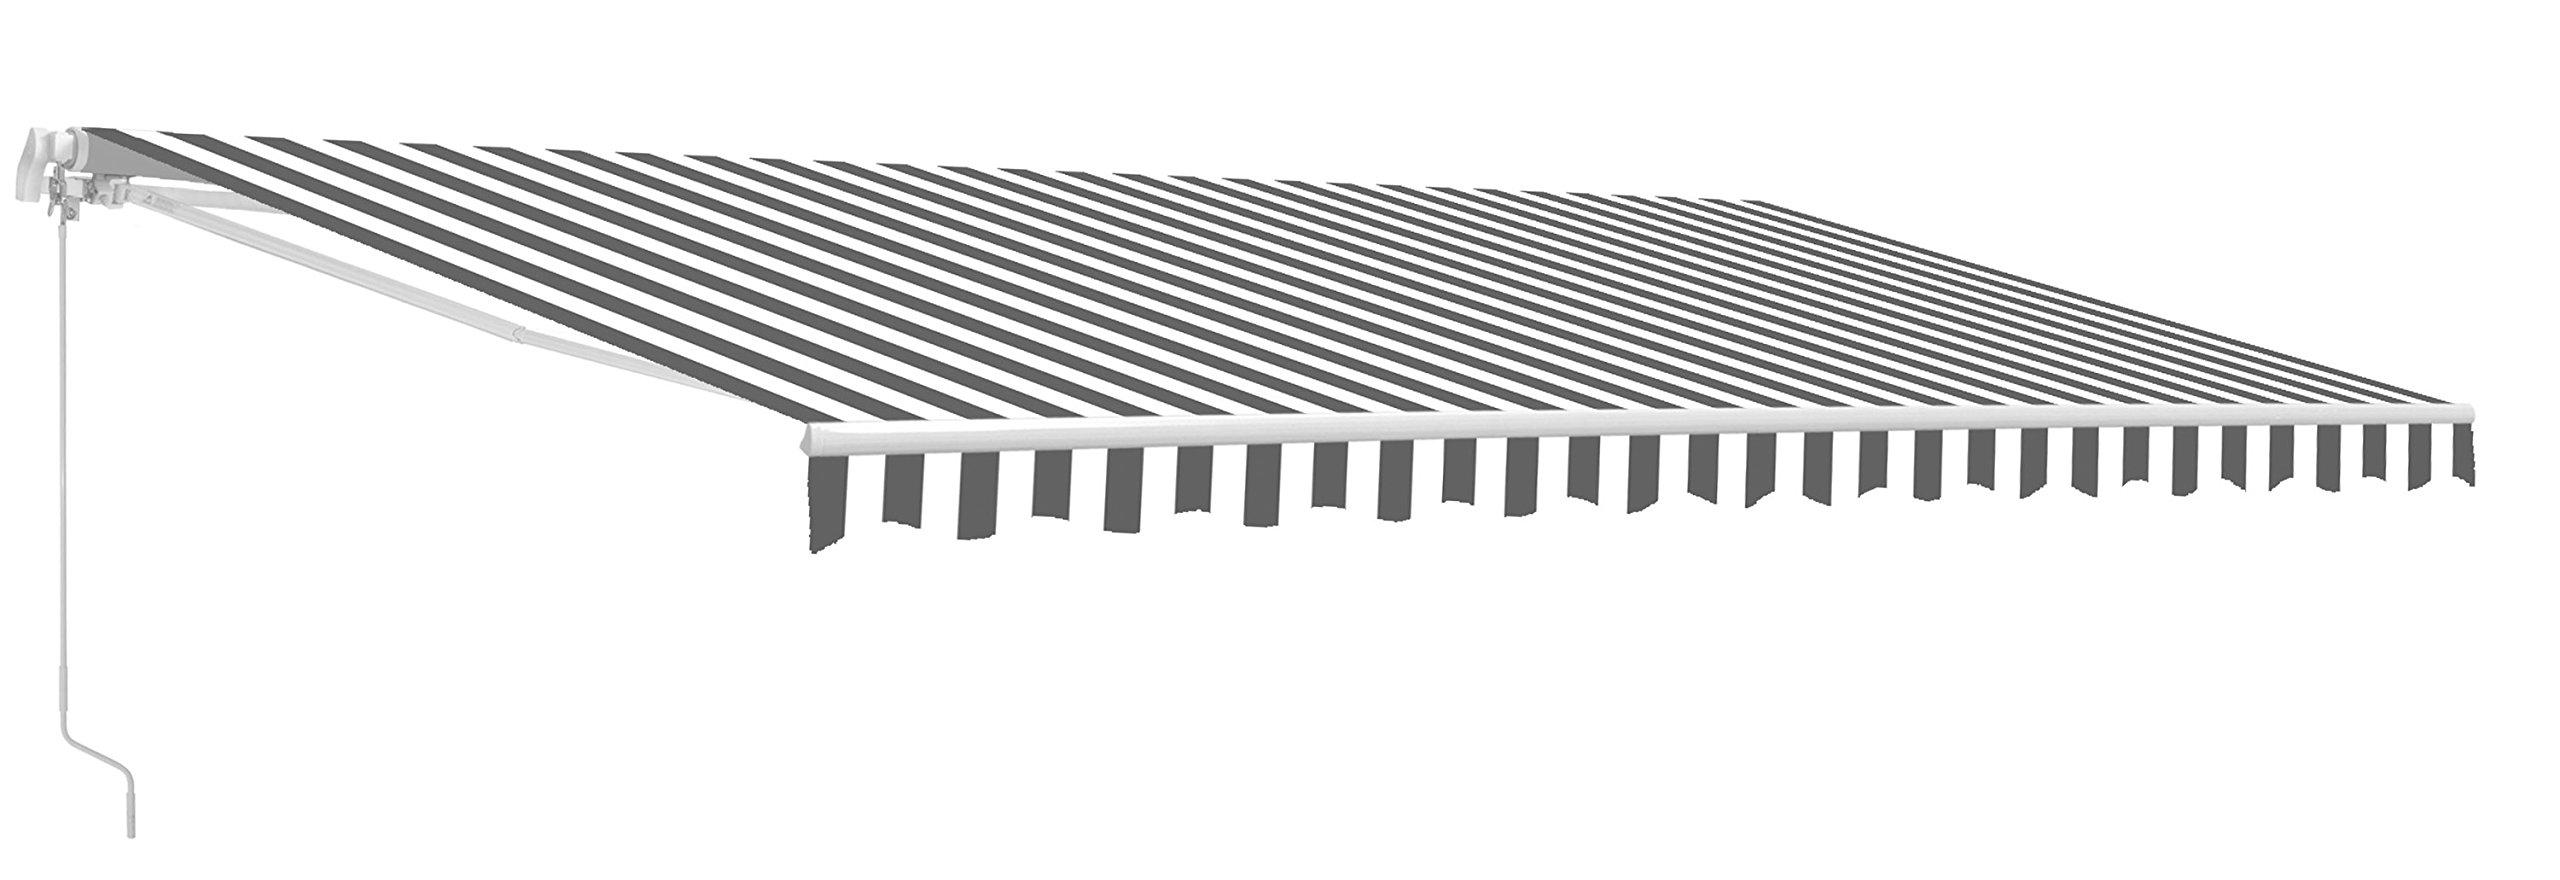 ALEKO AW13X10GREYWHT Retractable Patio Awning 13 x 10 Feet Gray and White Striped